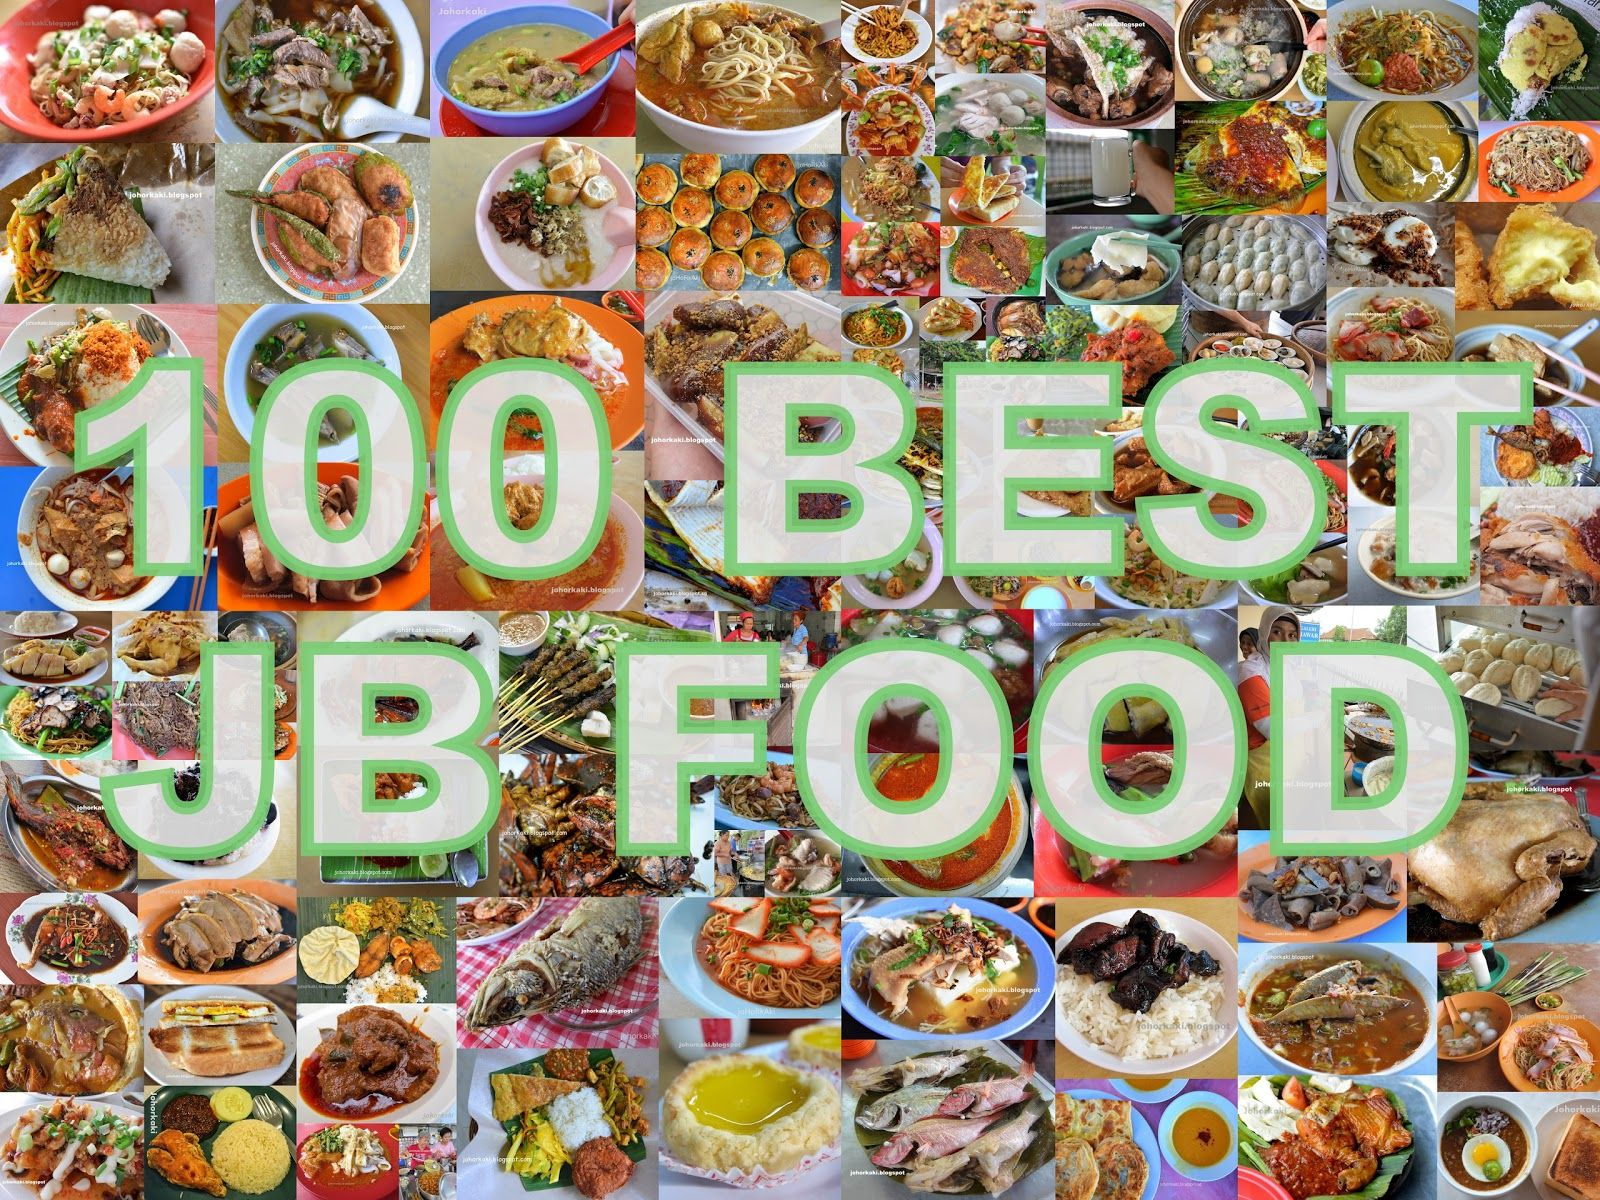 Johor Bahru 100 Best Street Hawker Food And Places To Eat In Jb 2016 2017 Johor Kaki Blogs Best Jb Singapore Food Food Singapore Food Travel Food